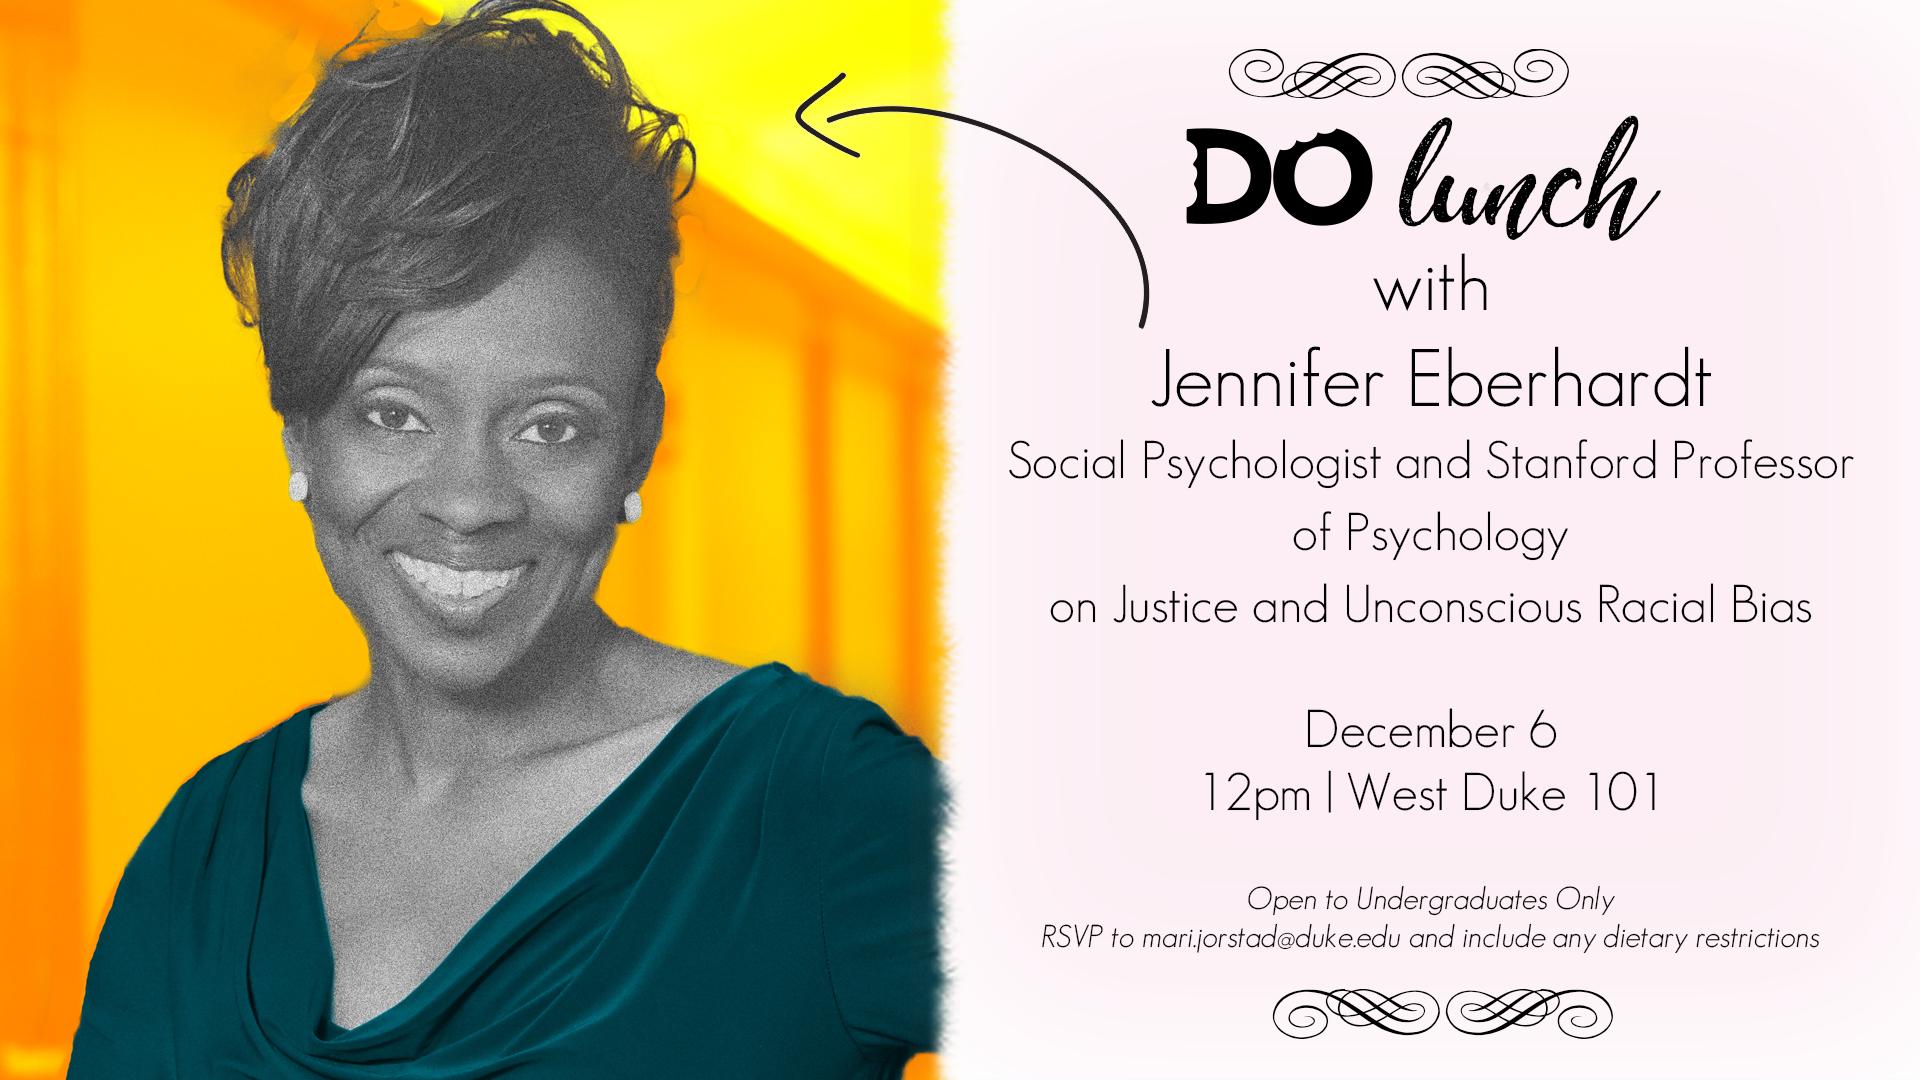 Do Lunch with Jennifer Eberhardt - info in text below